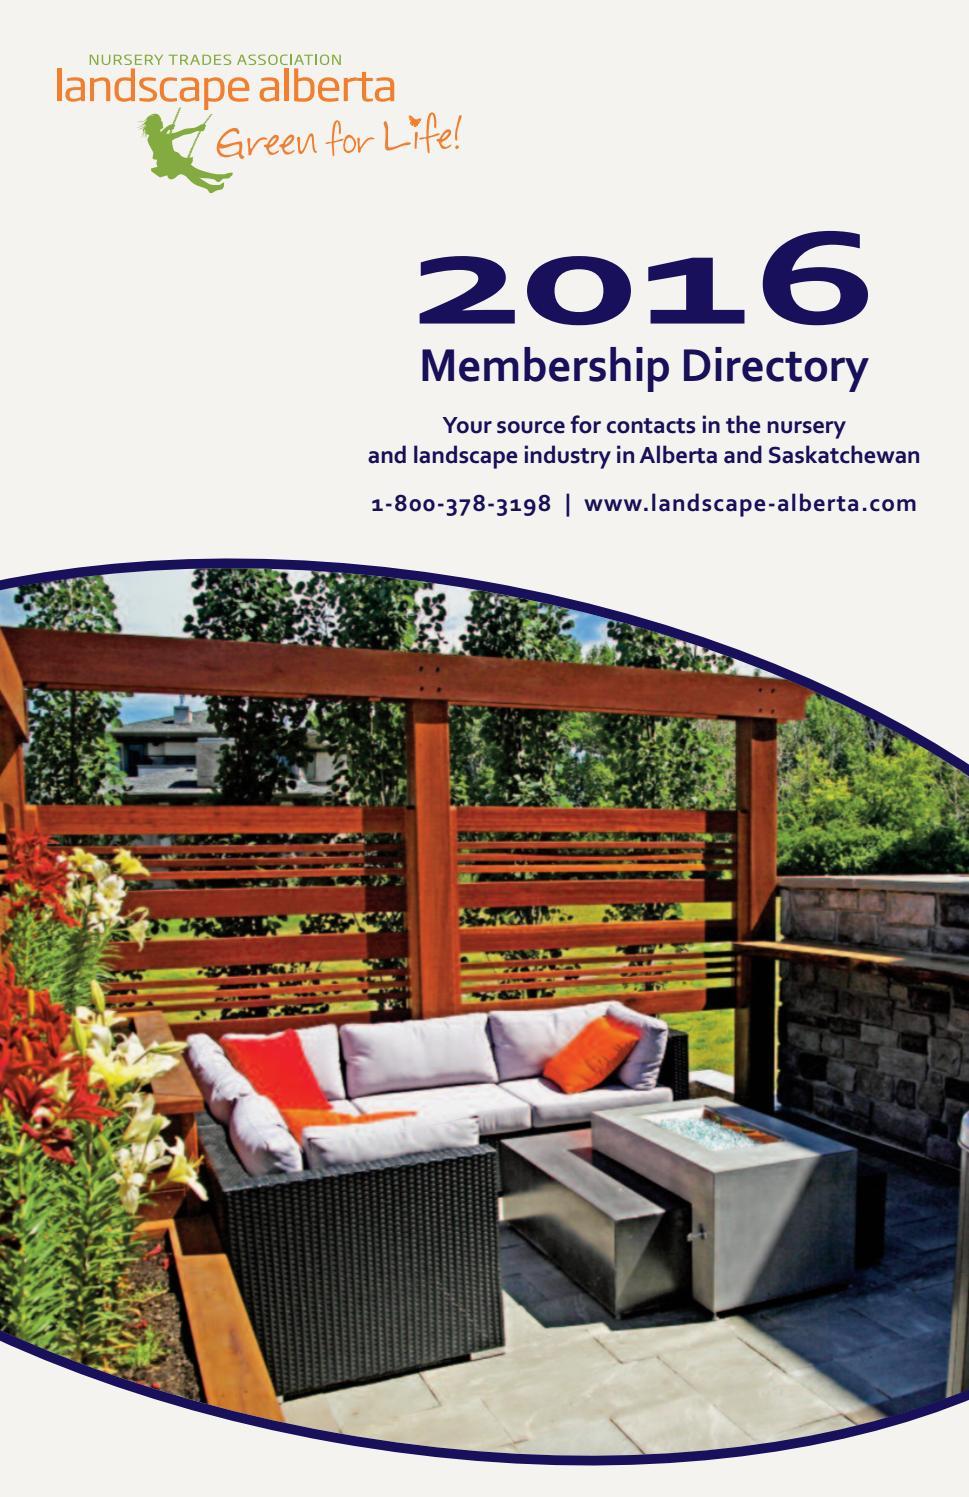 2011 CNLA Membership Source Guide By Canadian Nursery Landscape Association